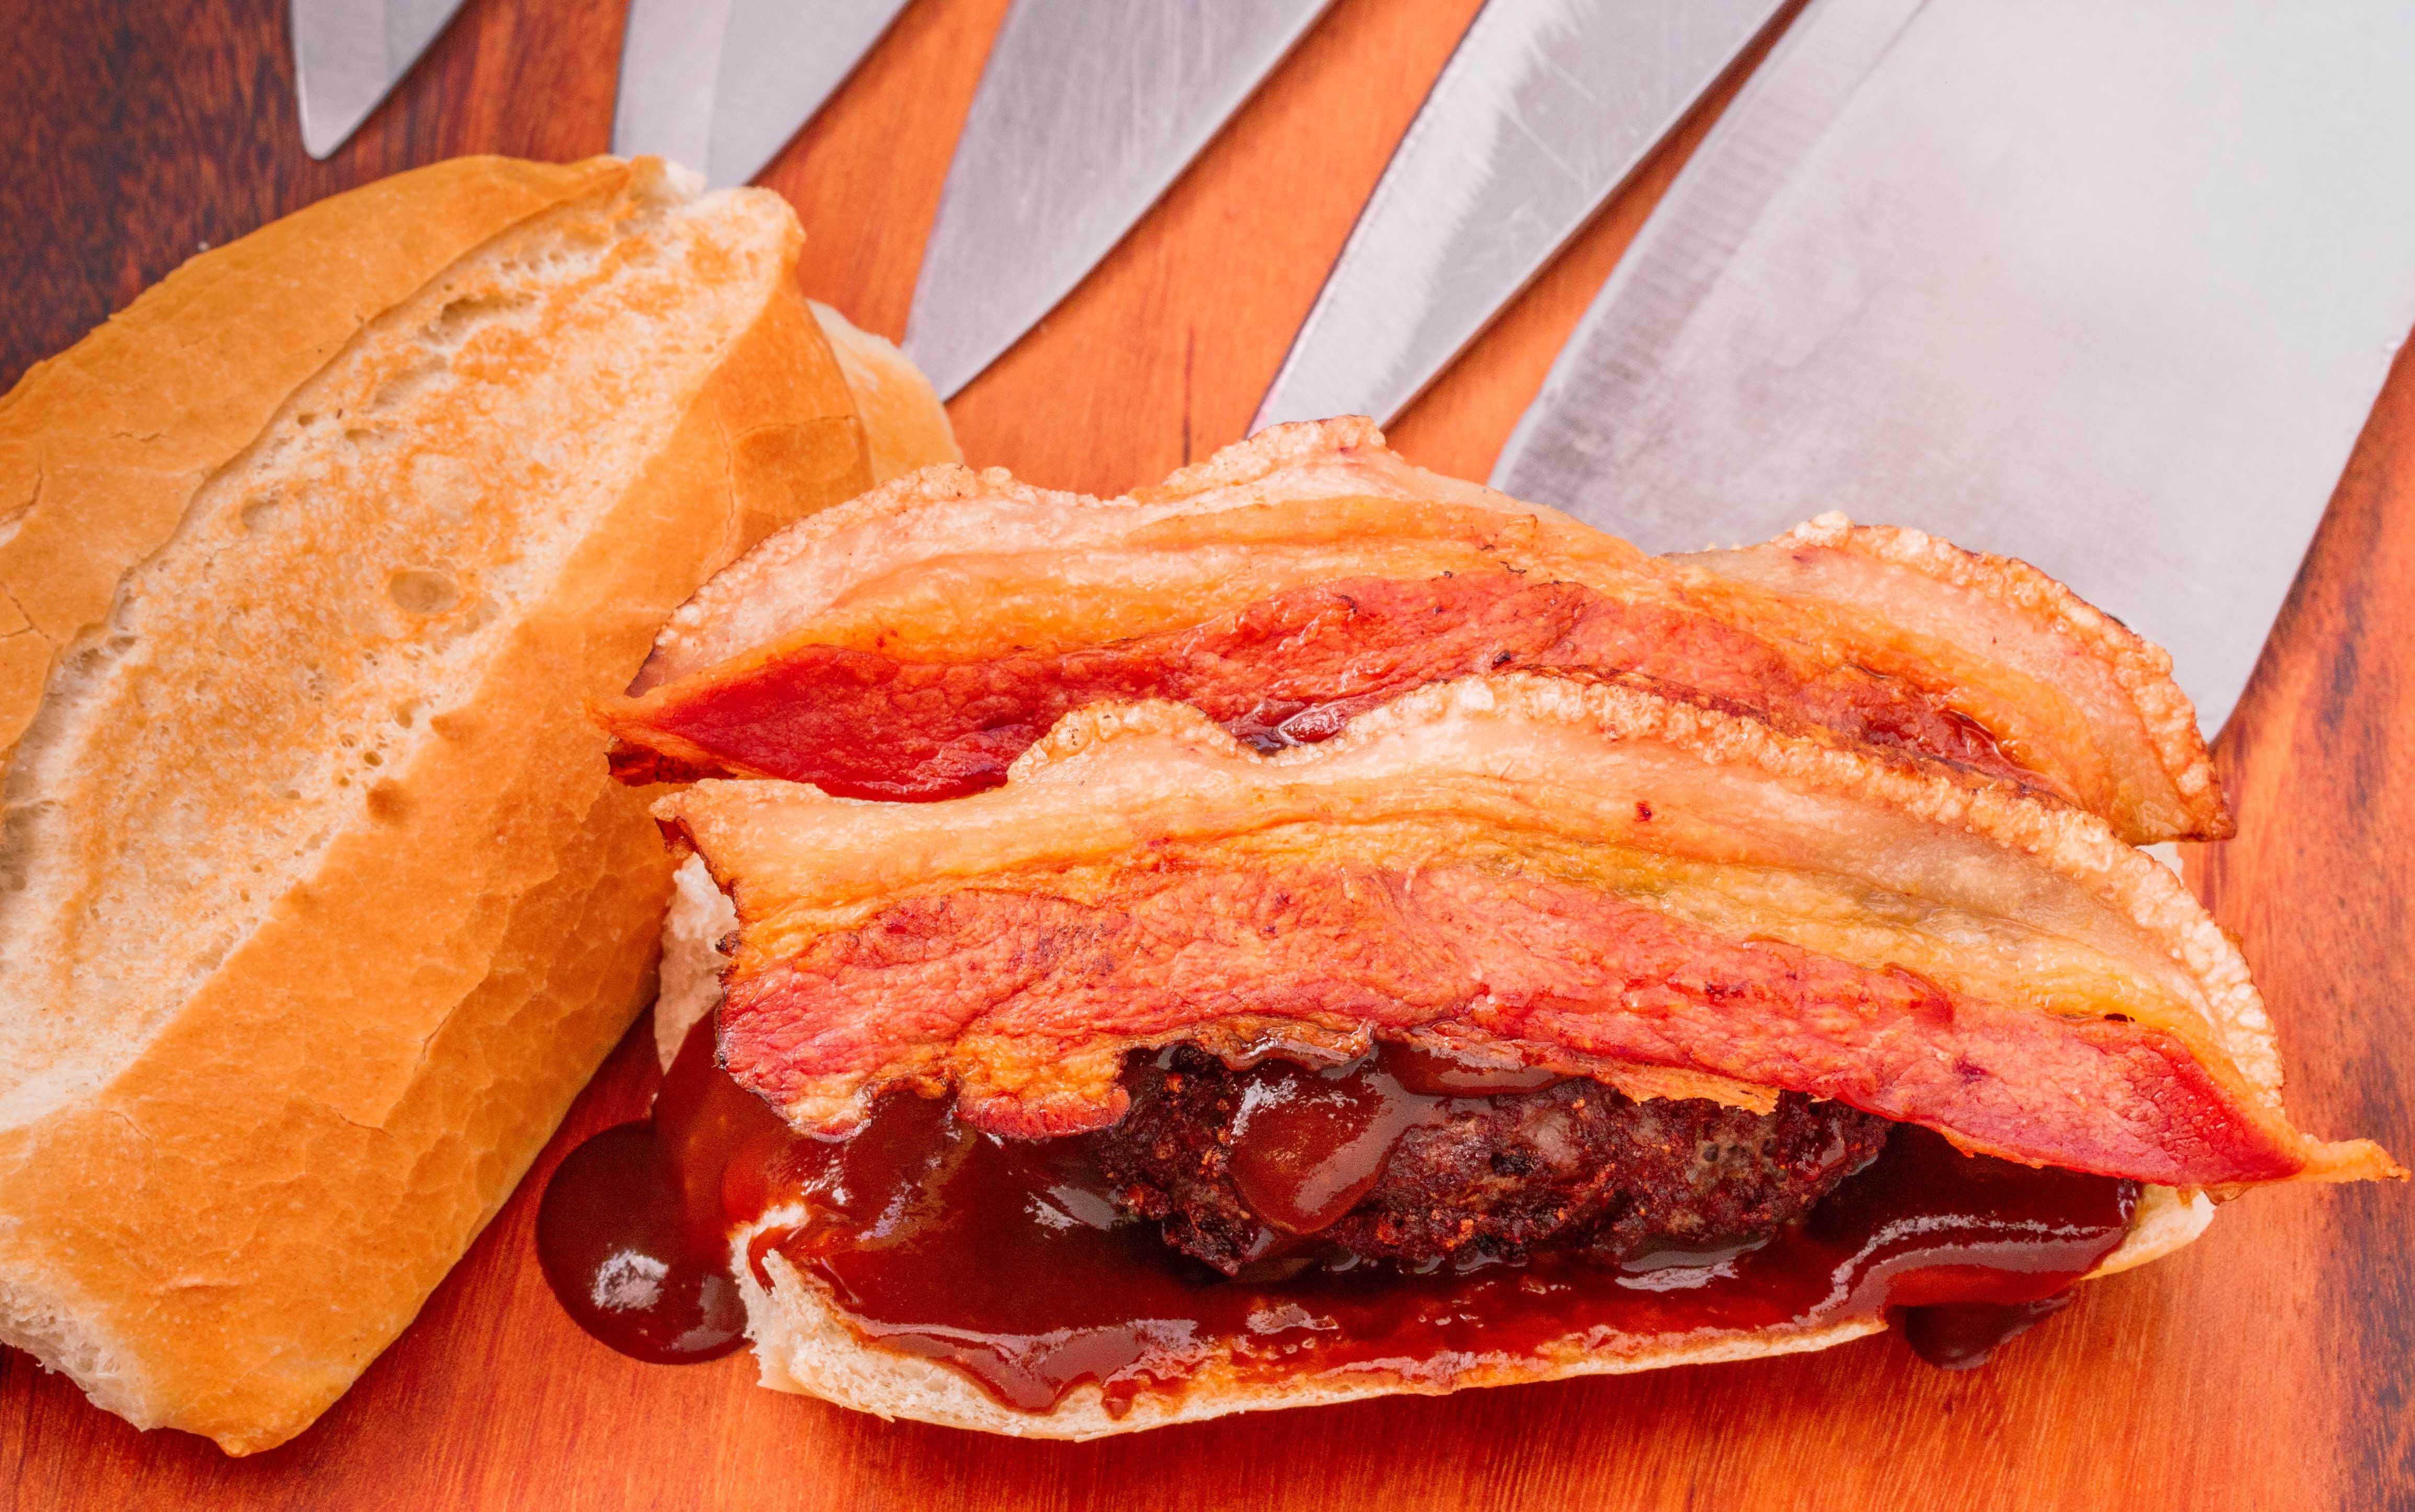 Porks - Cred Gean Carvalho